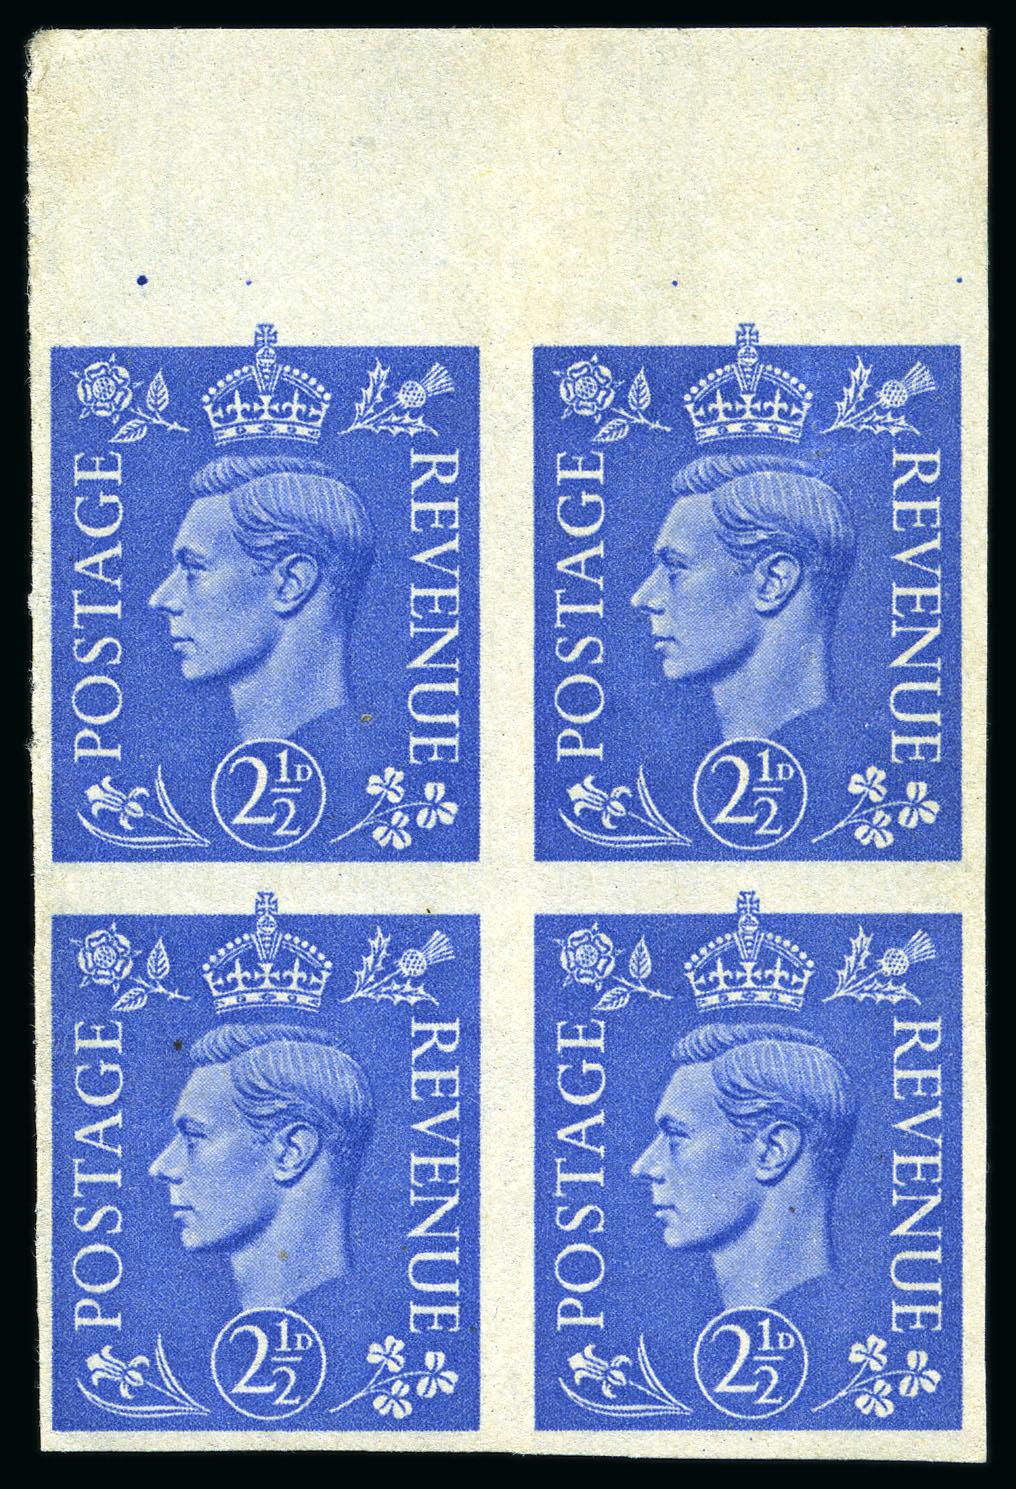 Leeward Island stamps